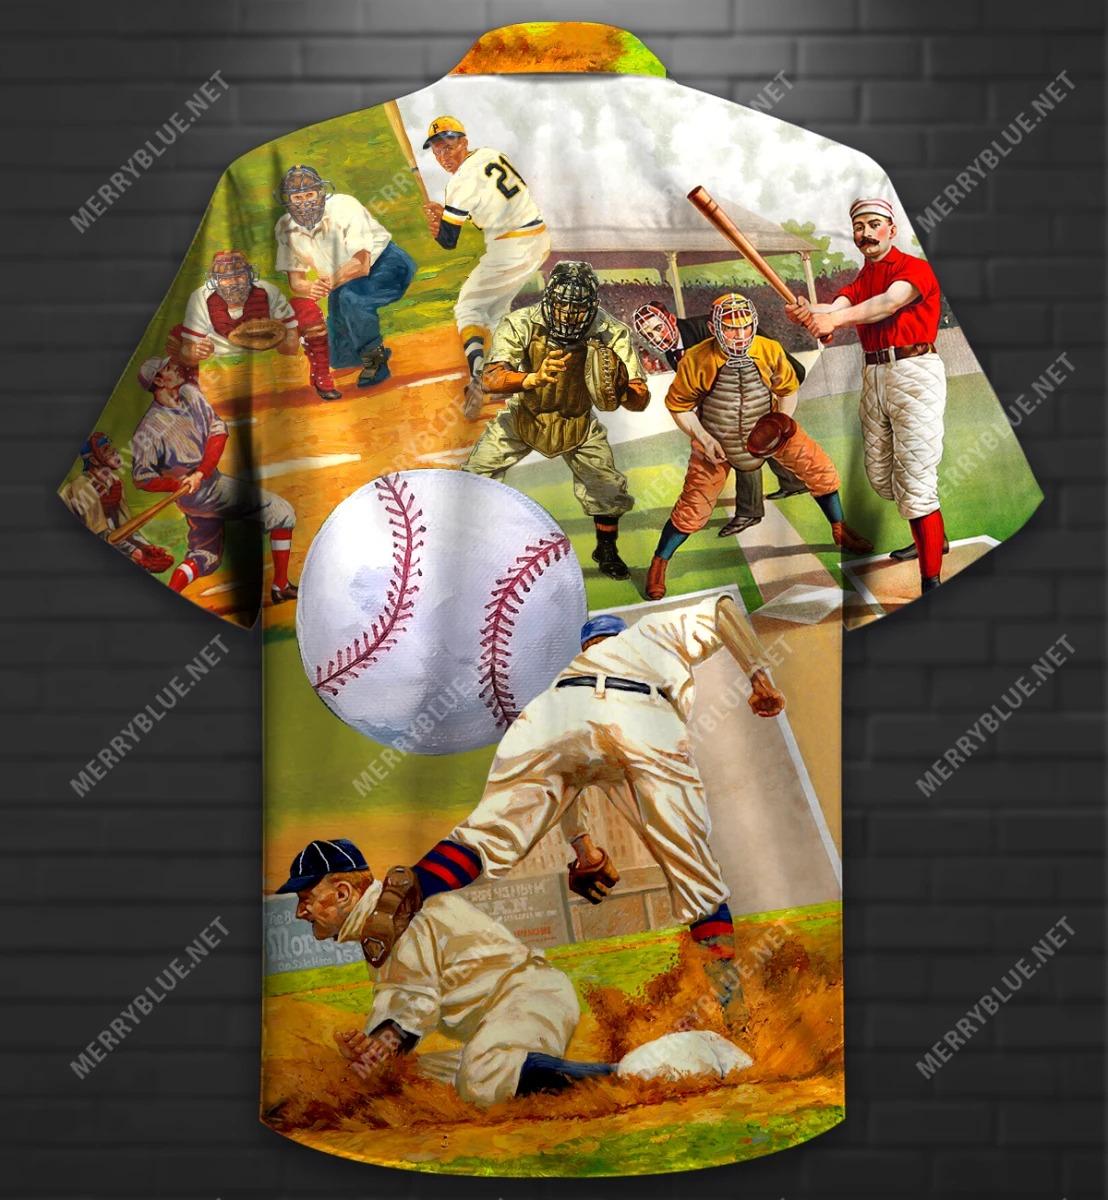 Playing Baseball Short Sleeve Shirt 2